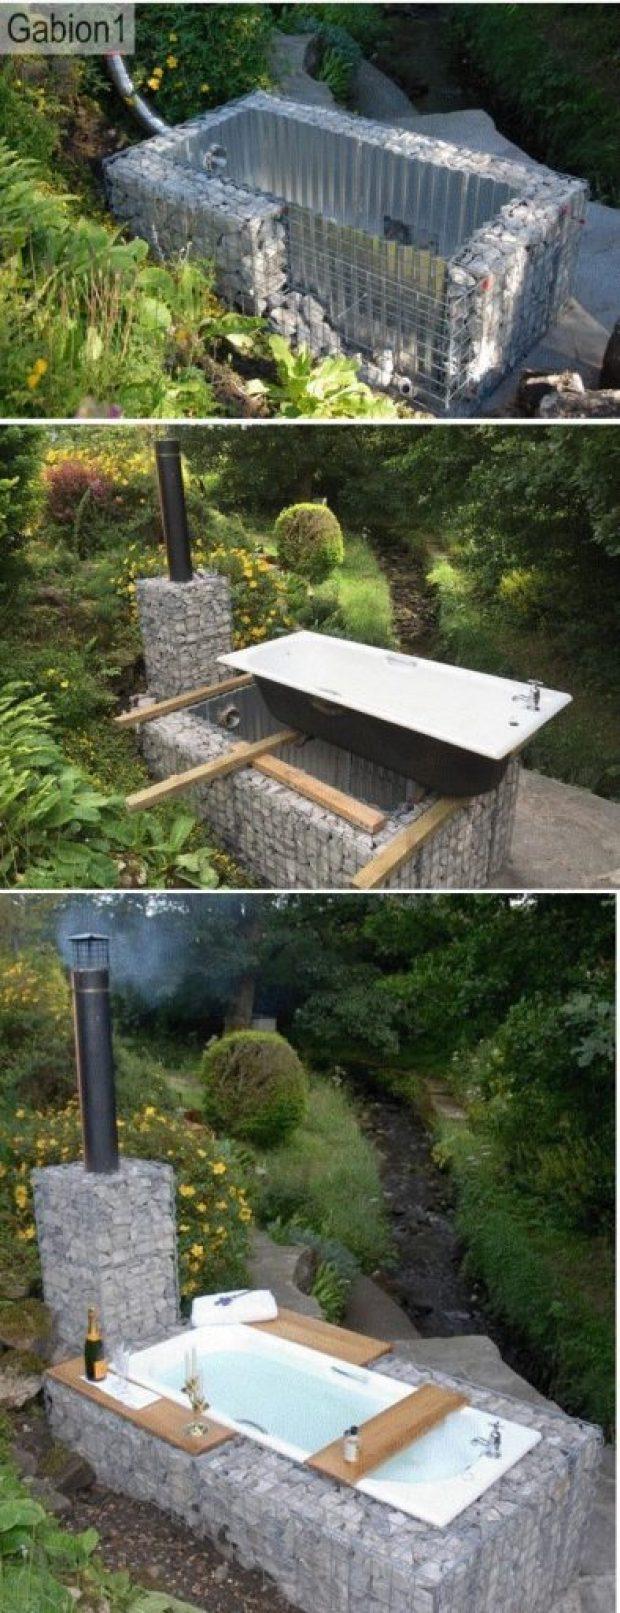 gabion-outdoor-bath-construction-1